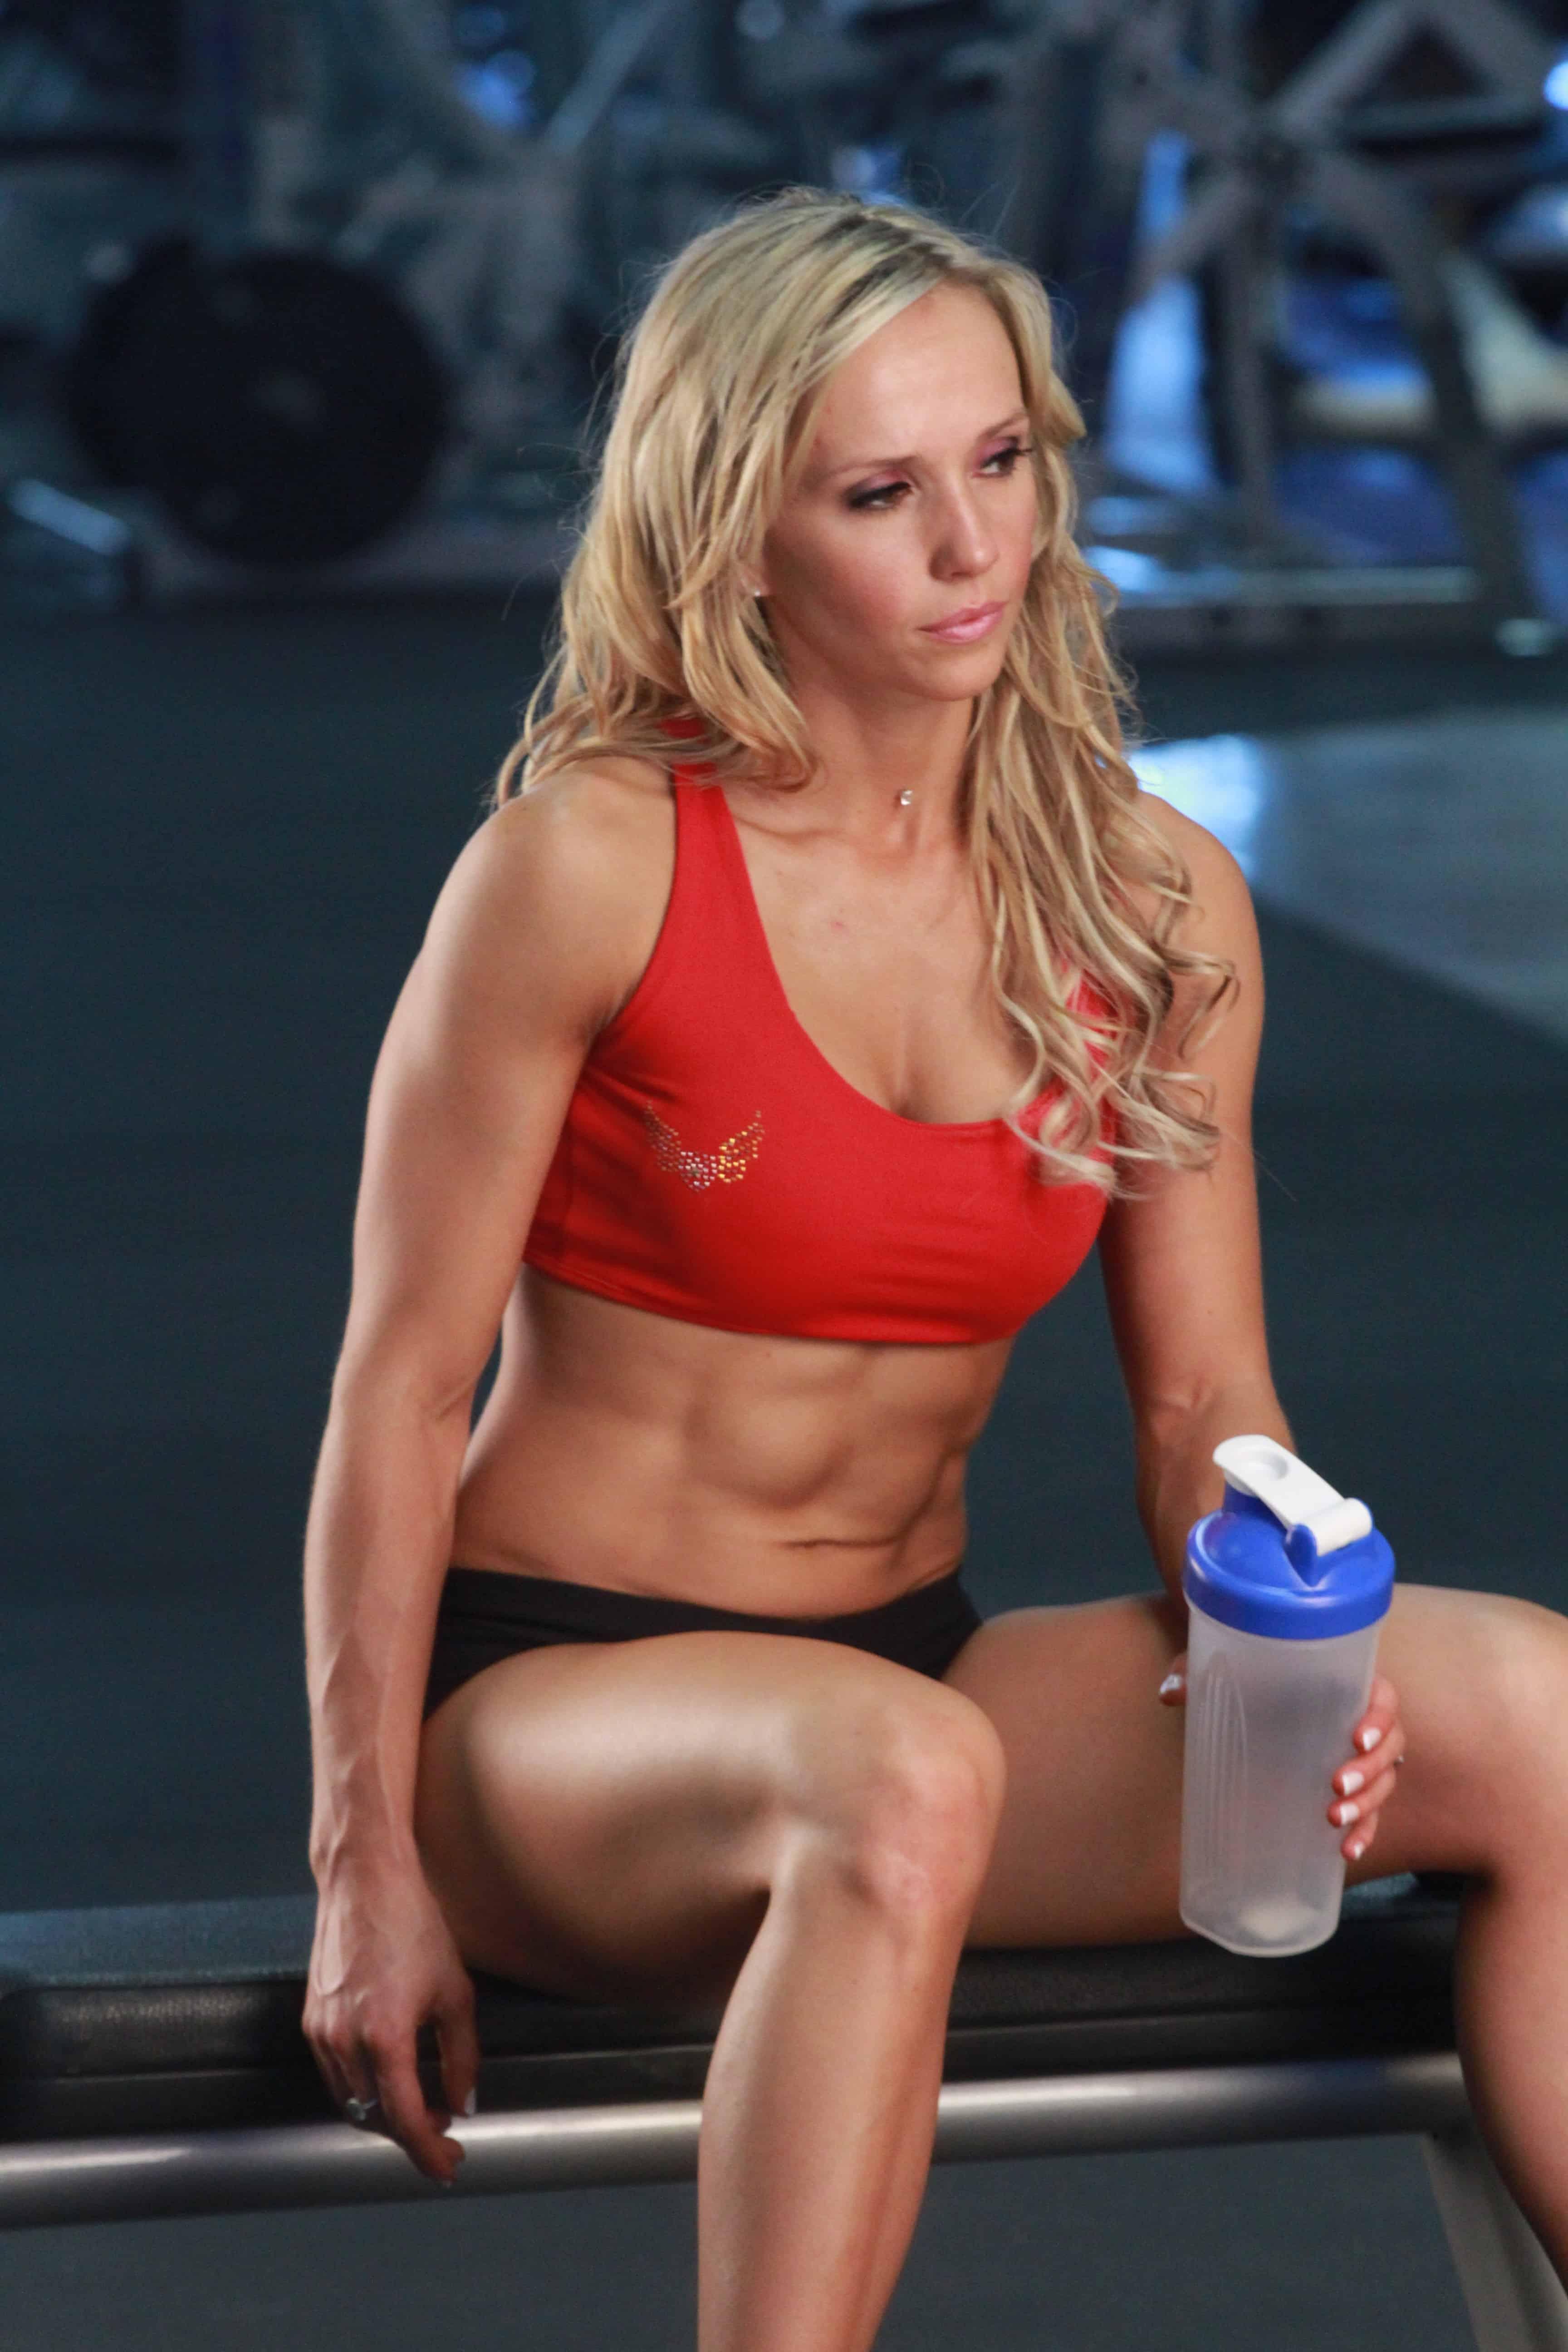 Abdominal Exercise For Women